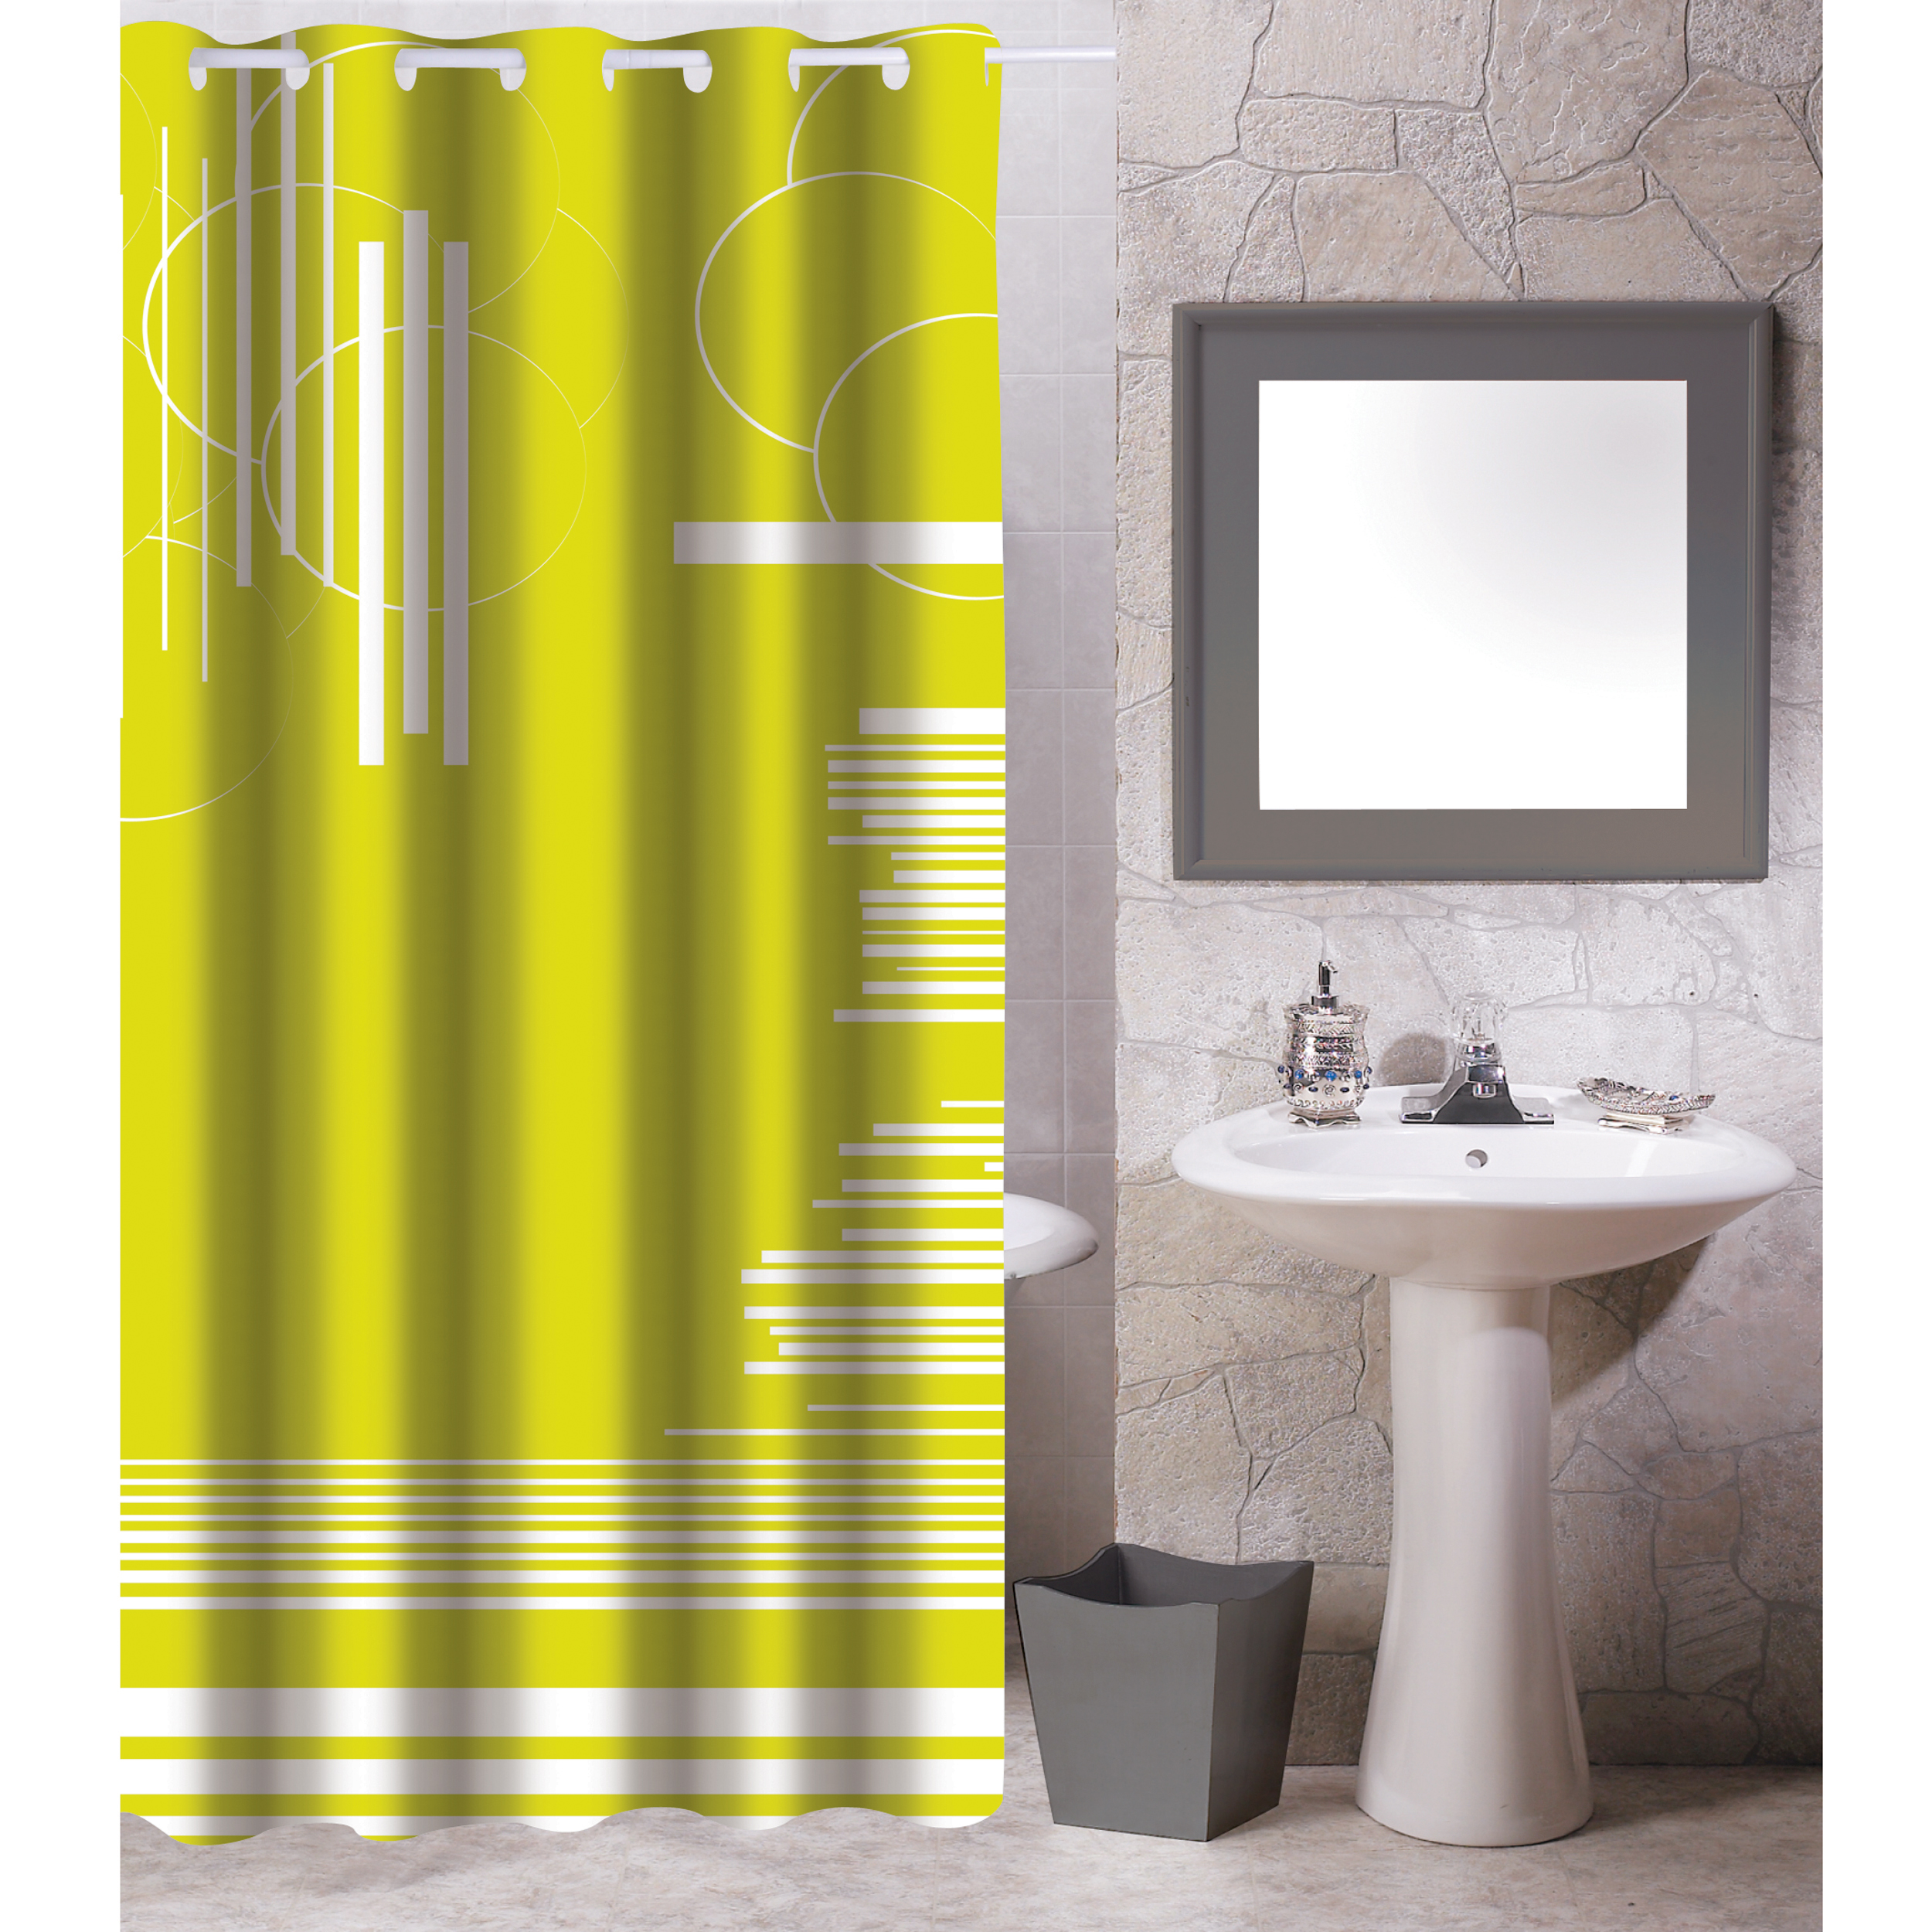 MSV Duschvorhang 180x200cm Anti Schimmel Textil Badewannenvorhang Wannenvorhang Graphics Grün